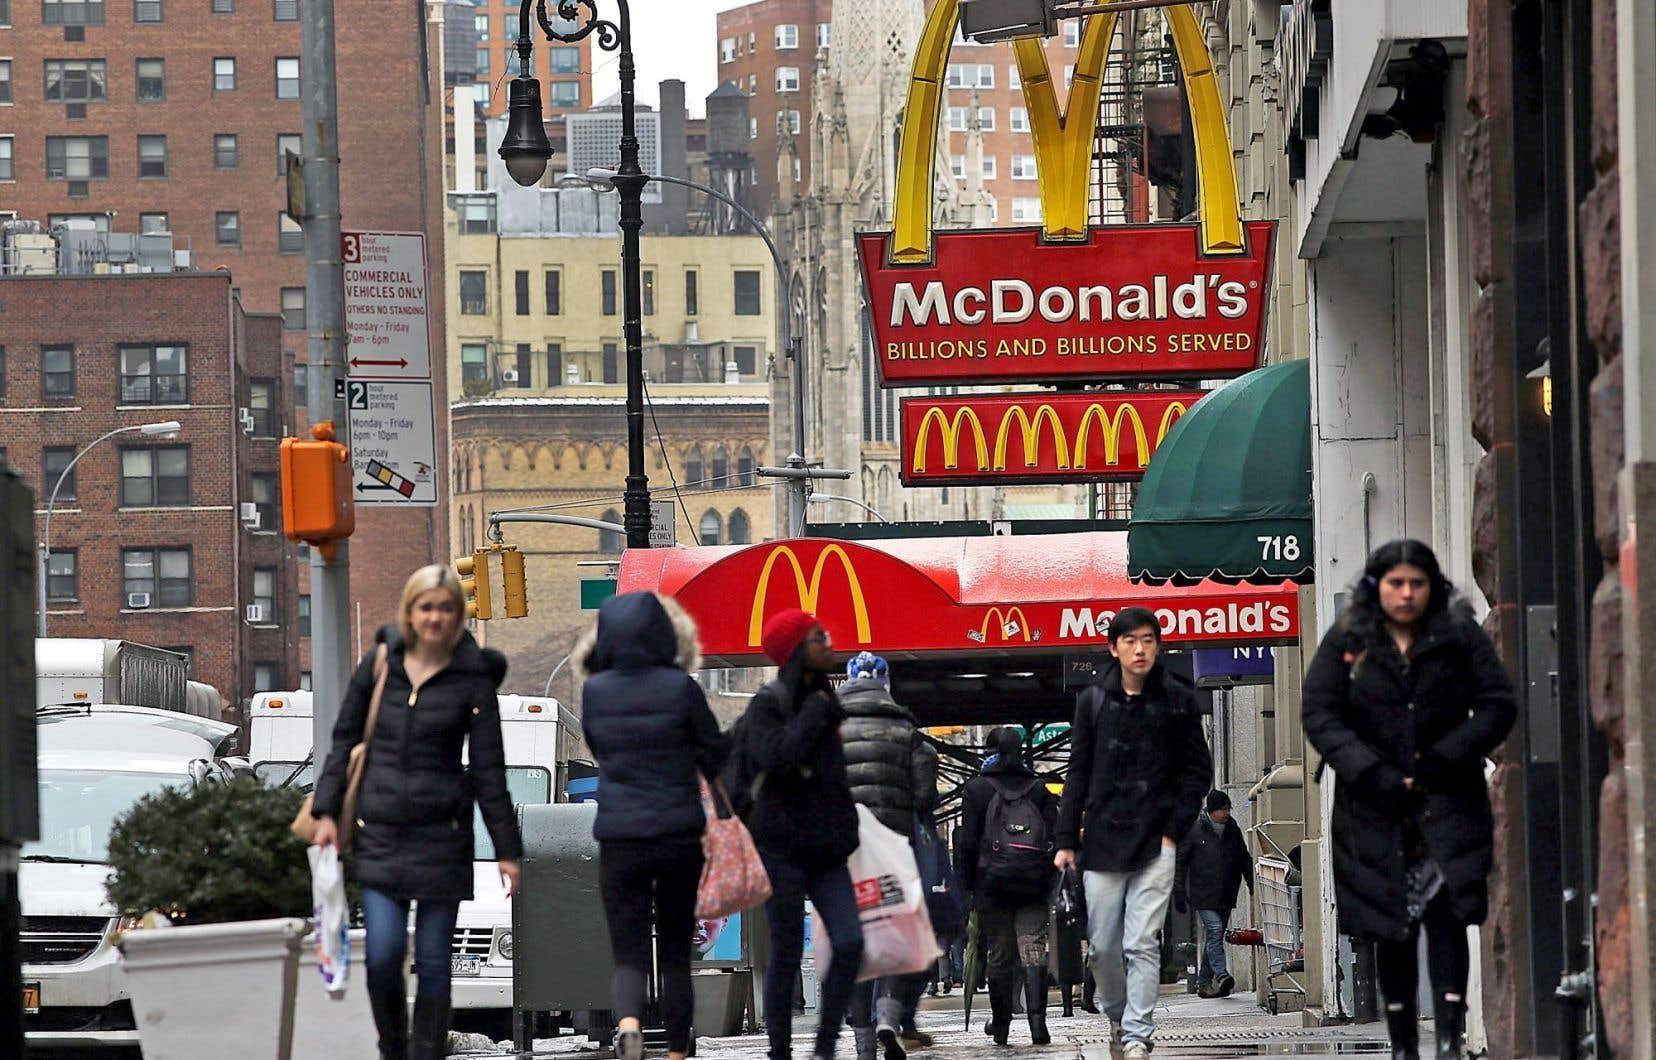 Les ventes, les revenus et les profits de McDonald's sont en recul.